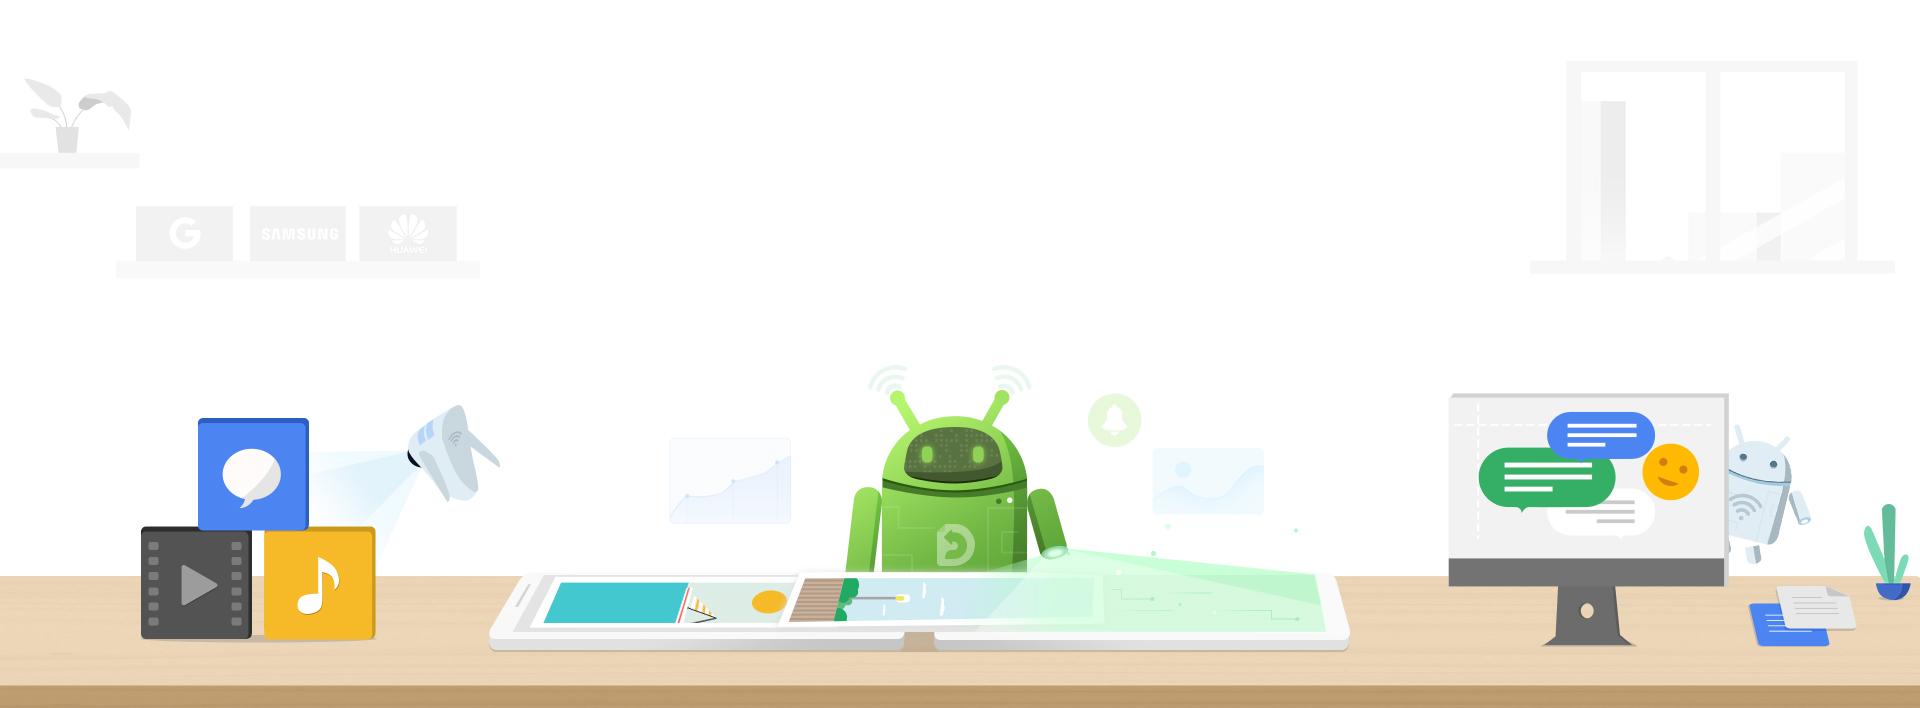 AnyDroid 7.4.0.20200923 Mac 破解版 Android数据管理器